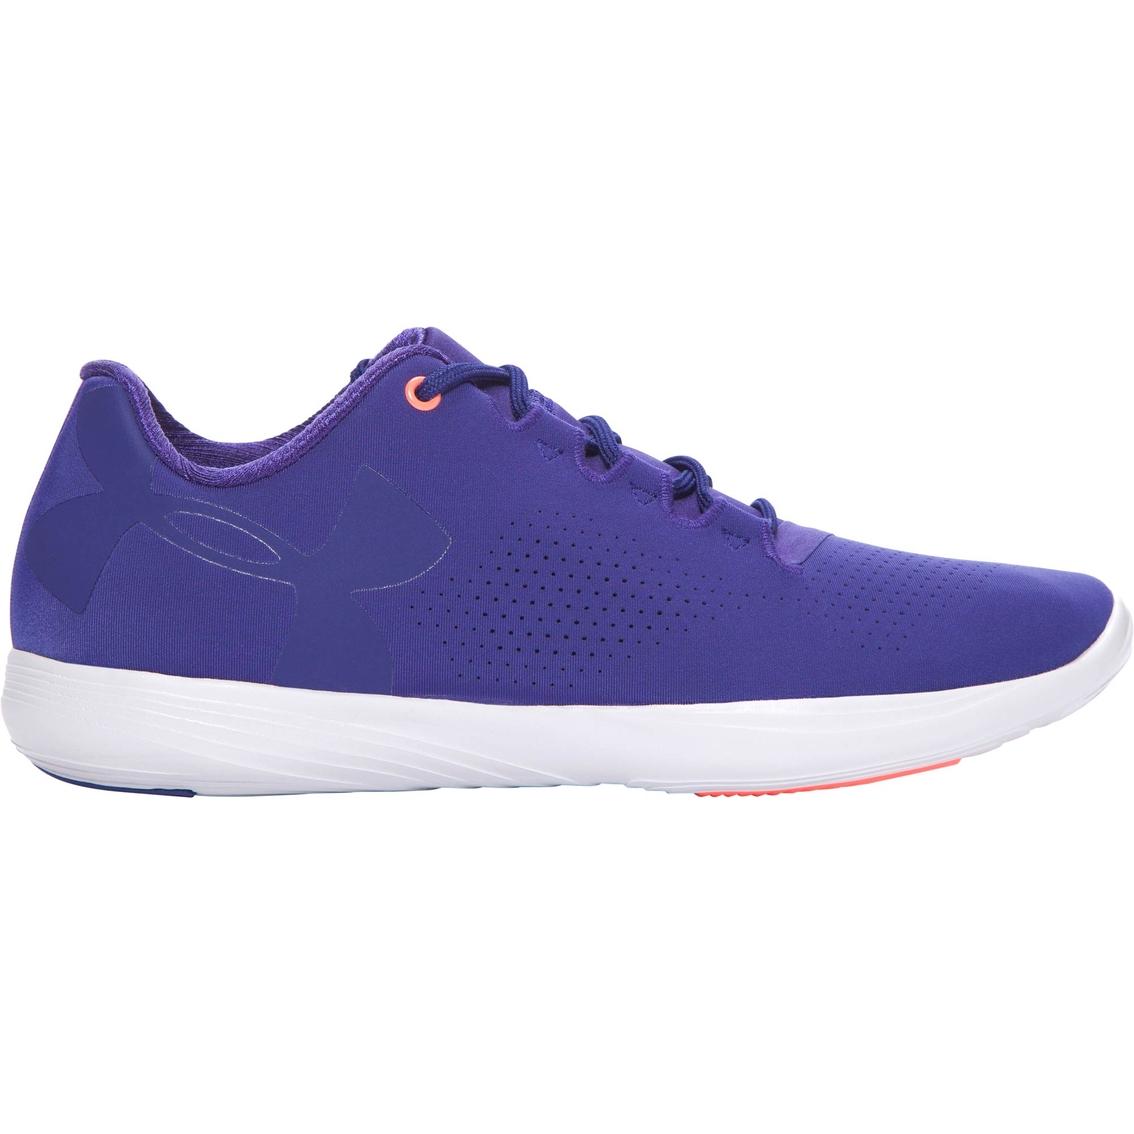 Under Armour Women s Street Precision Low Athletic Shoes  9eaac5d131